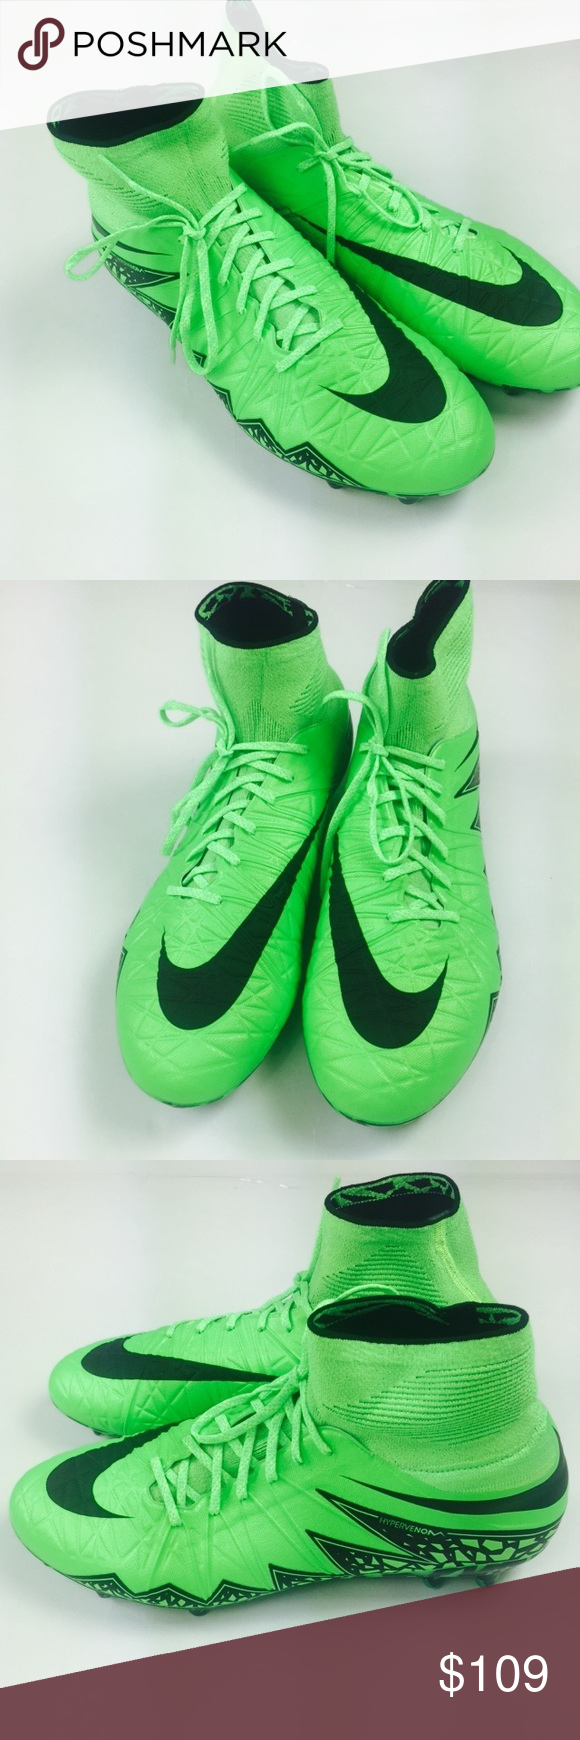 51aa9e6a0c8 Nike Hypervenom Phantom II FG Green Soccer Cleats Nike Hypervenom Phantom II  FG Men Green Strike